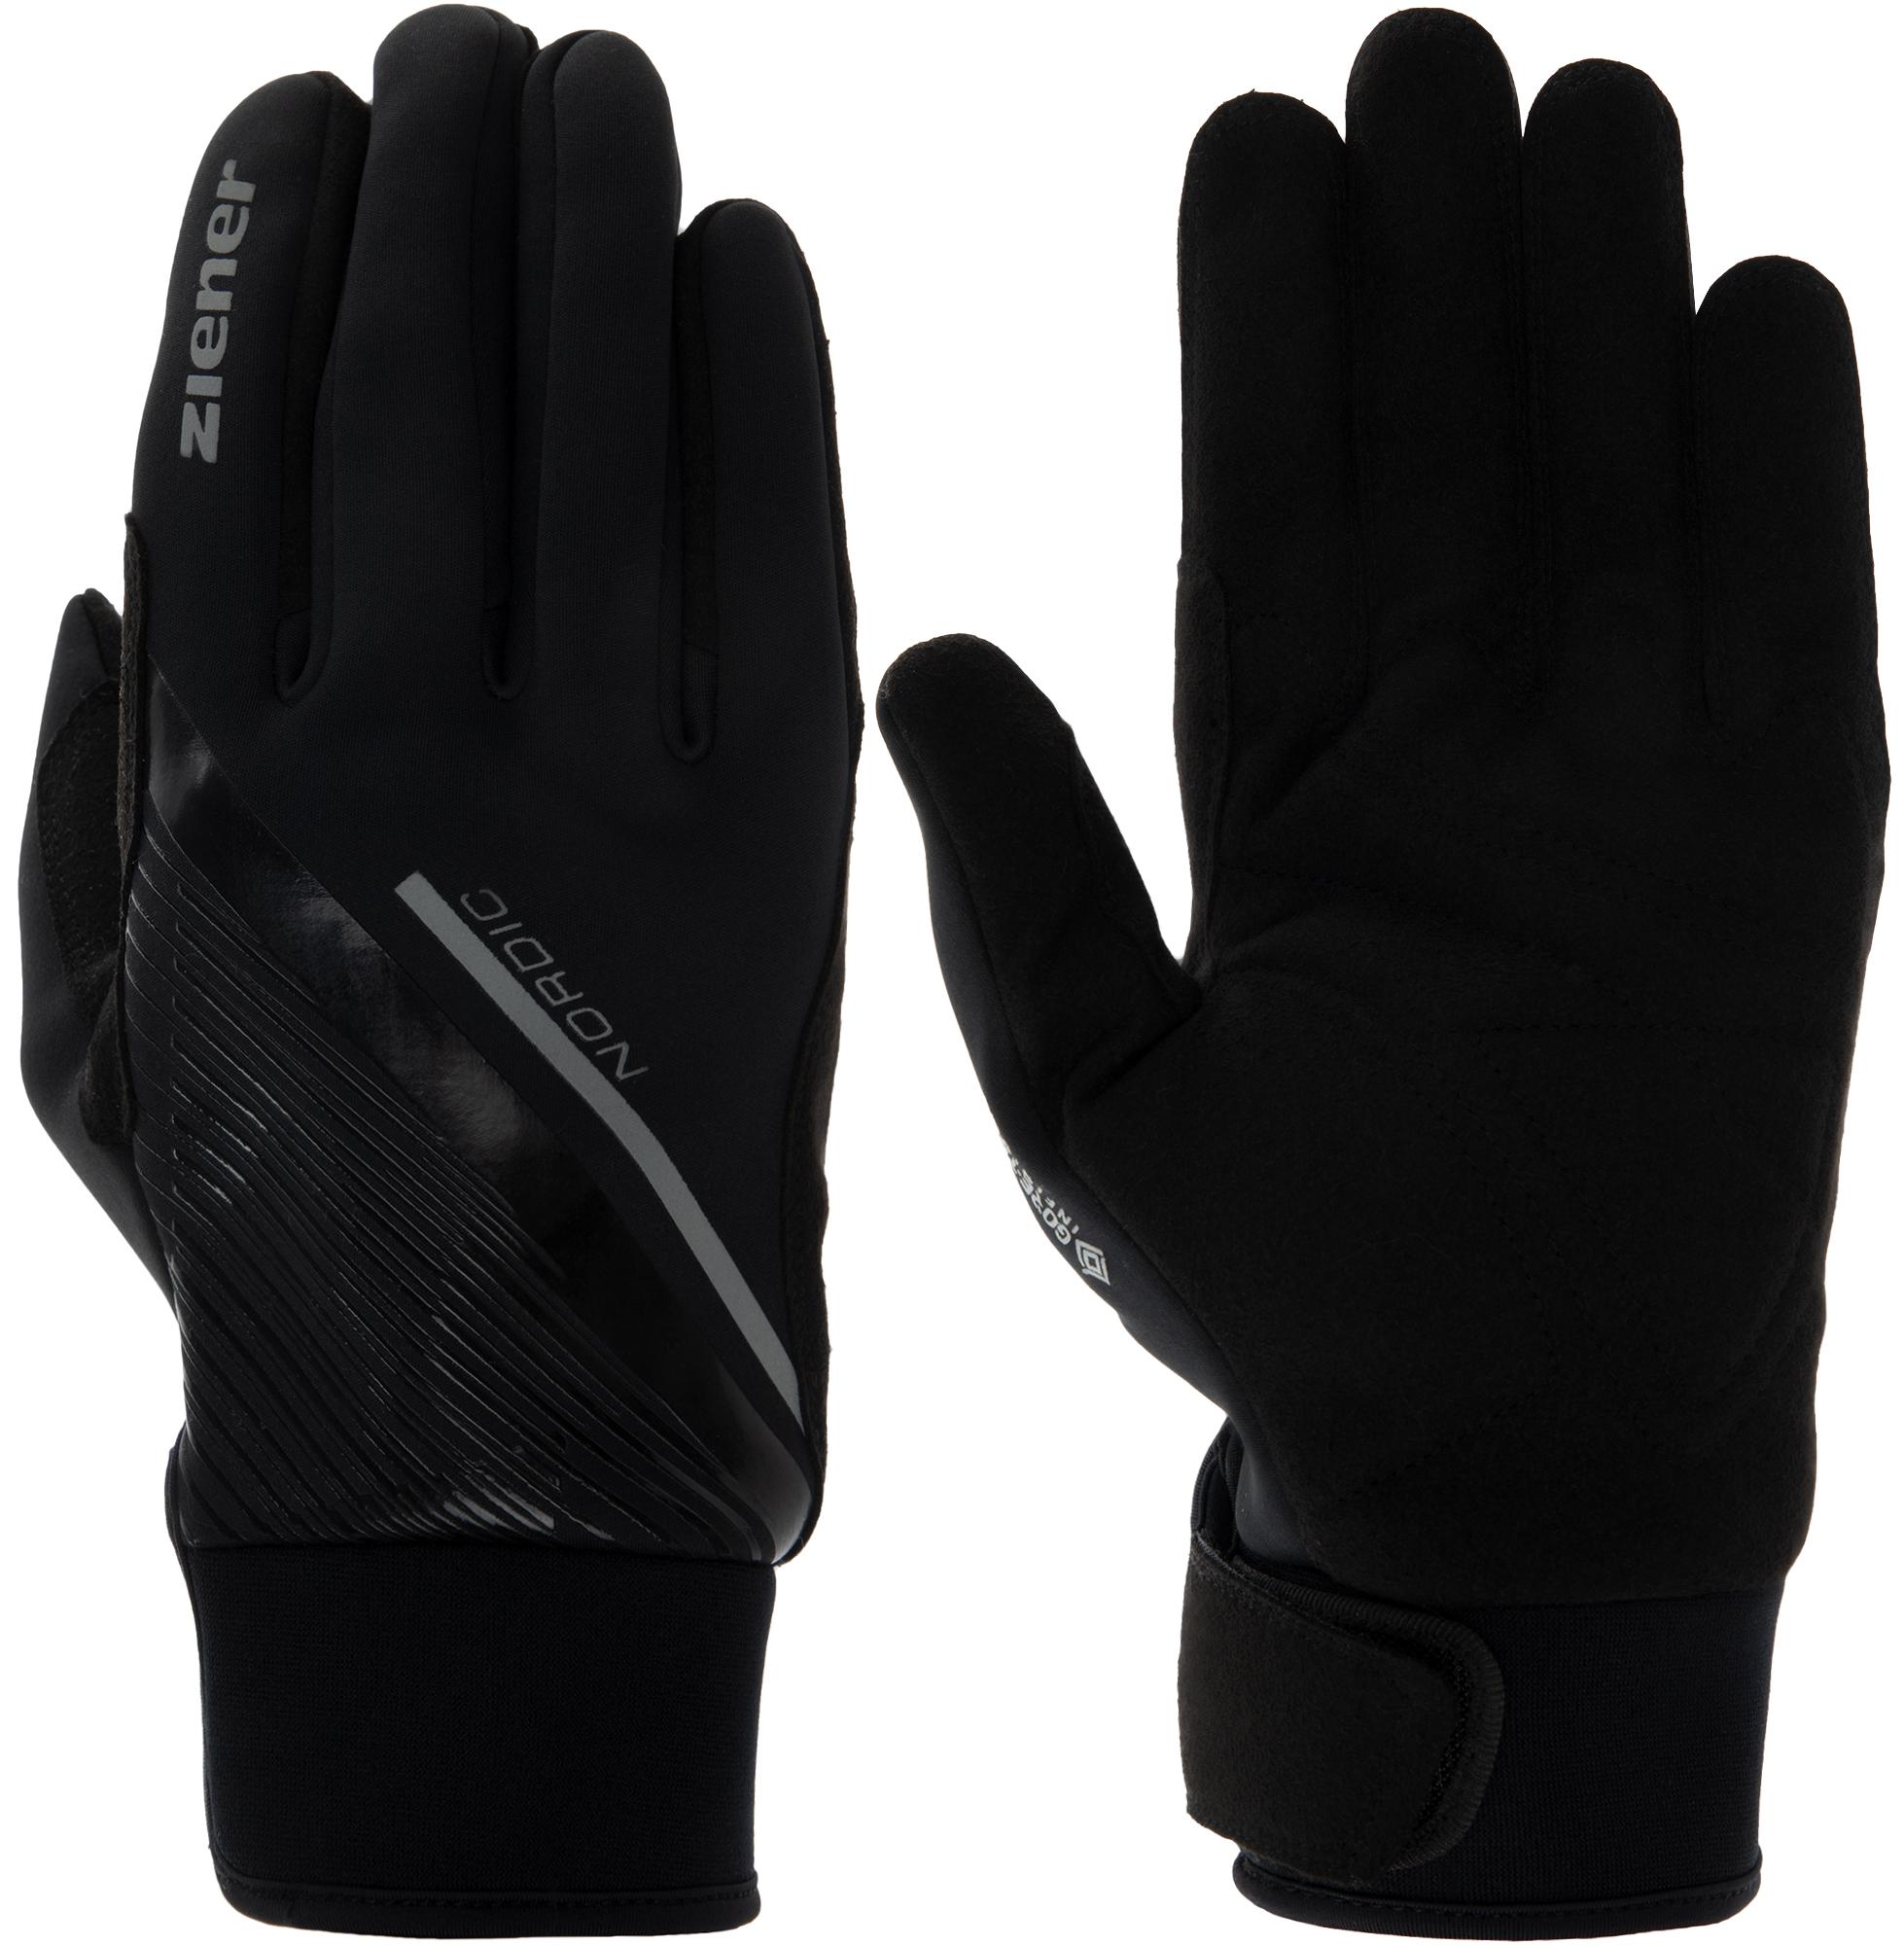 Ziener Перчатки Ziener, размер 9 перчатки jetasafety jle021 9 l12